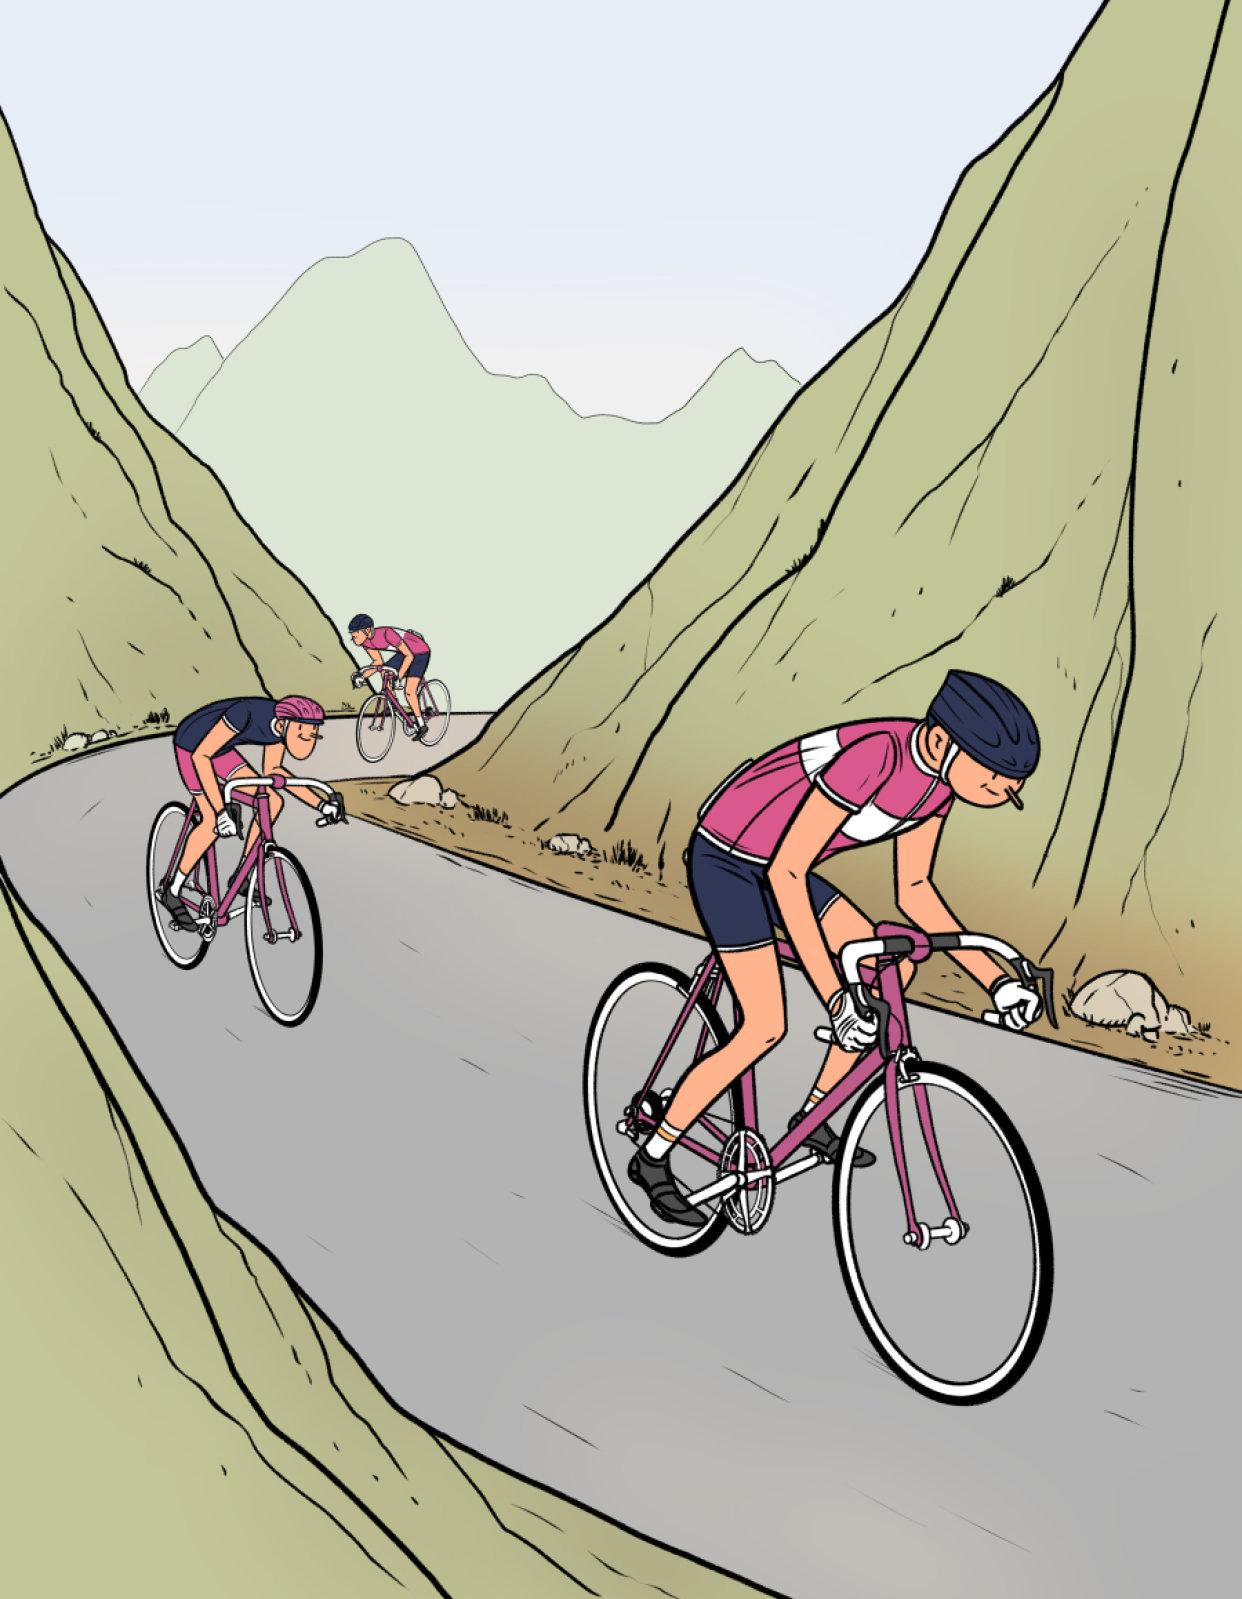 ride-journal-janne-iivonen-web-version,medium_large.2x.1418426368